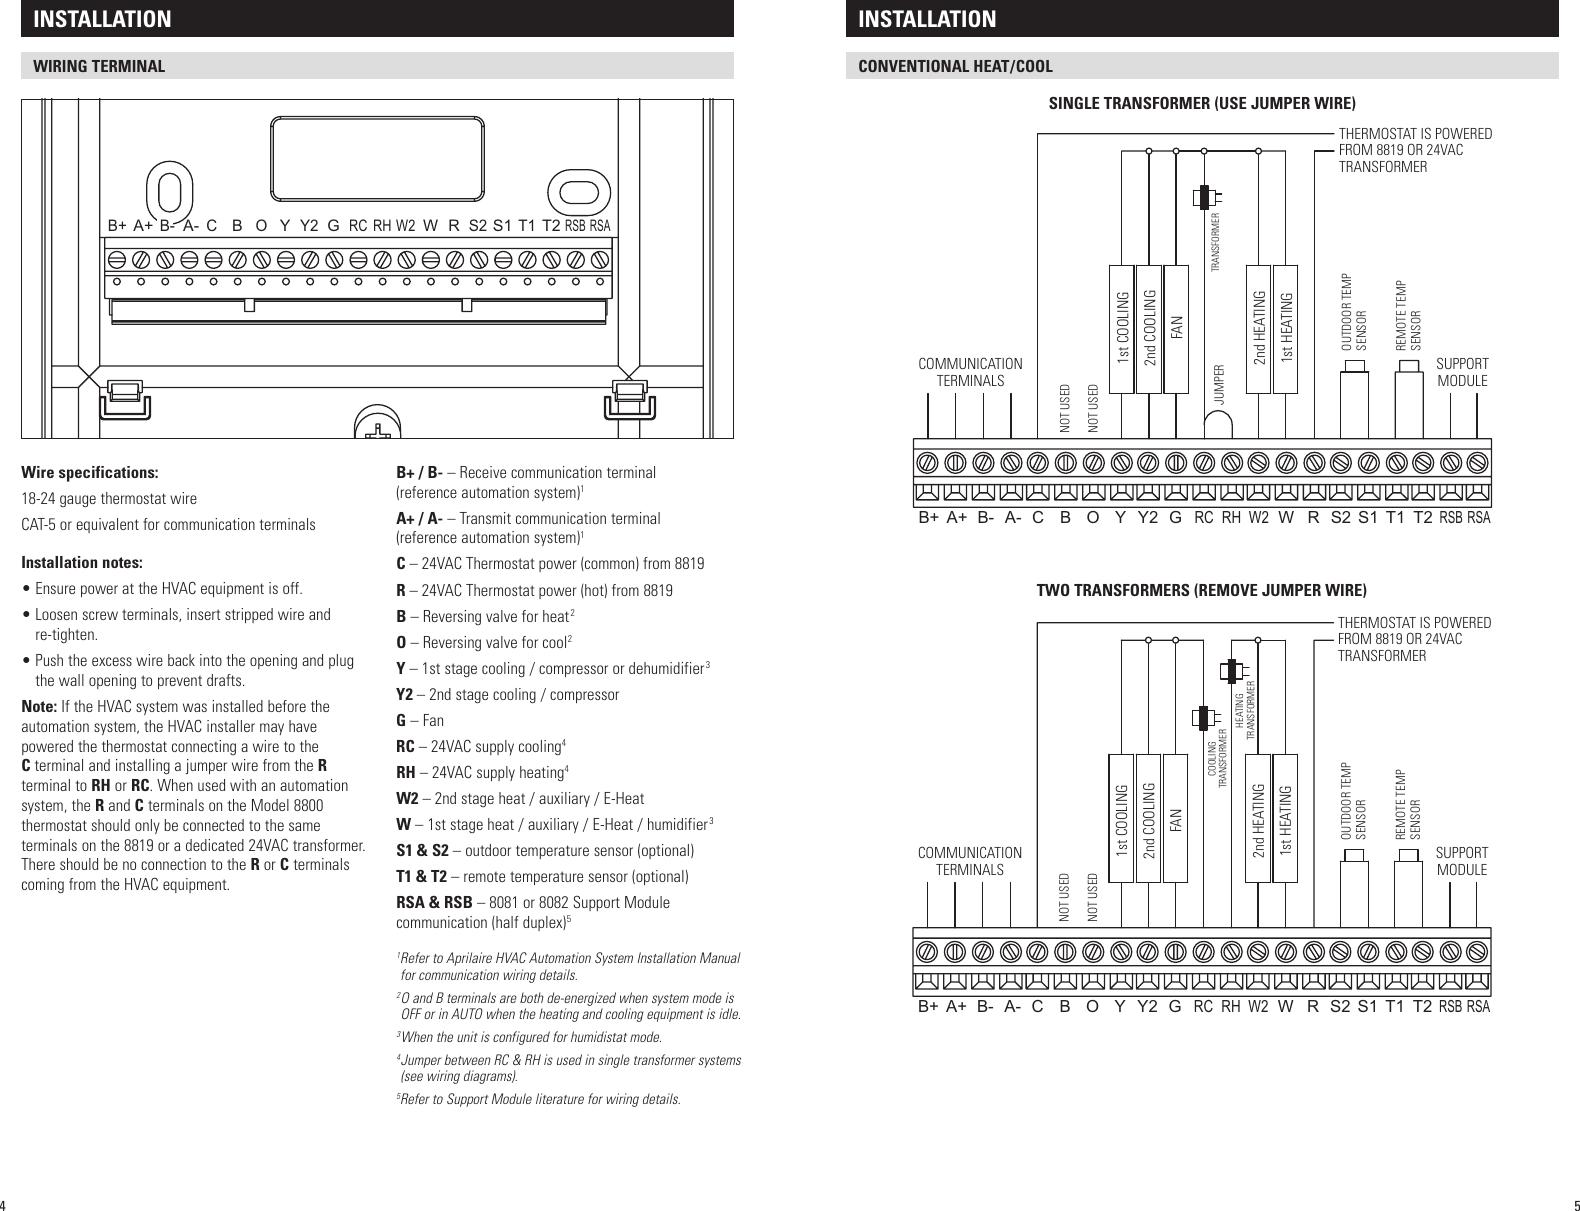 Aprilaire 60 Humidistat Wiring Diagram Casagovau Bar Graph Templates Manual Modern Image Collection Electrical Aprilairethermostat8800usersmanual467306